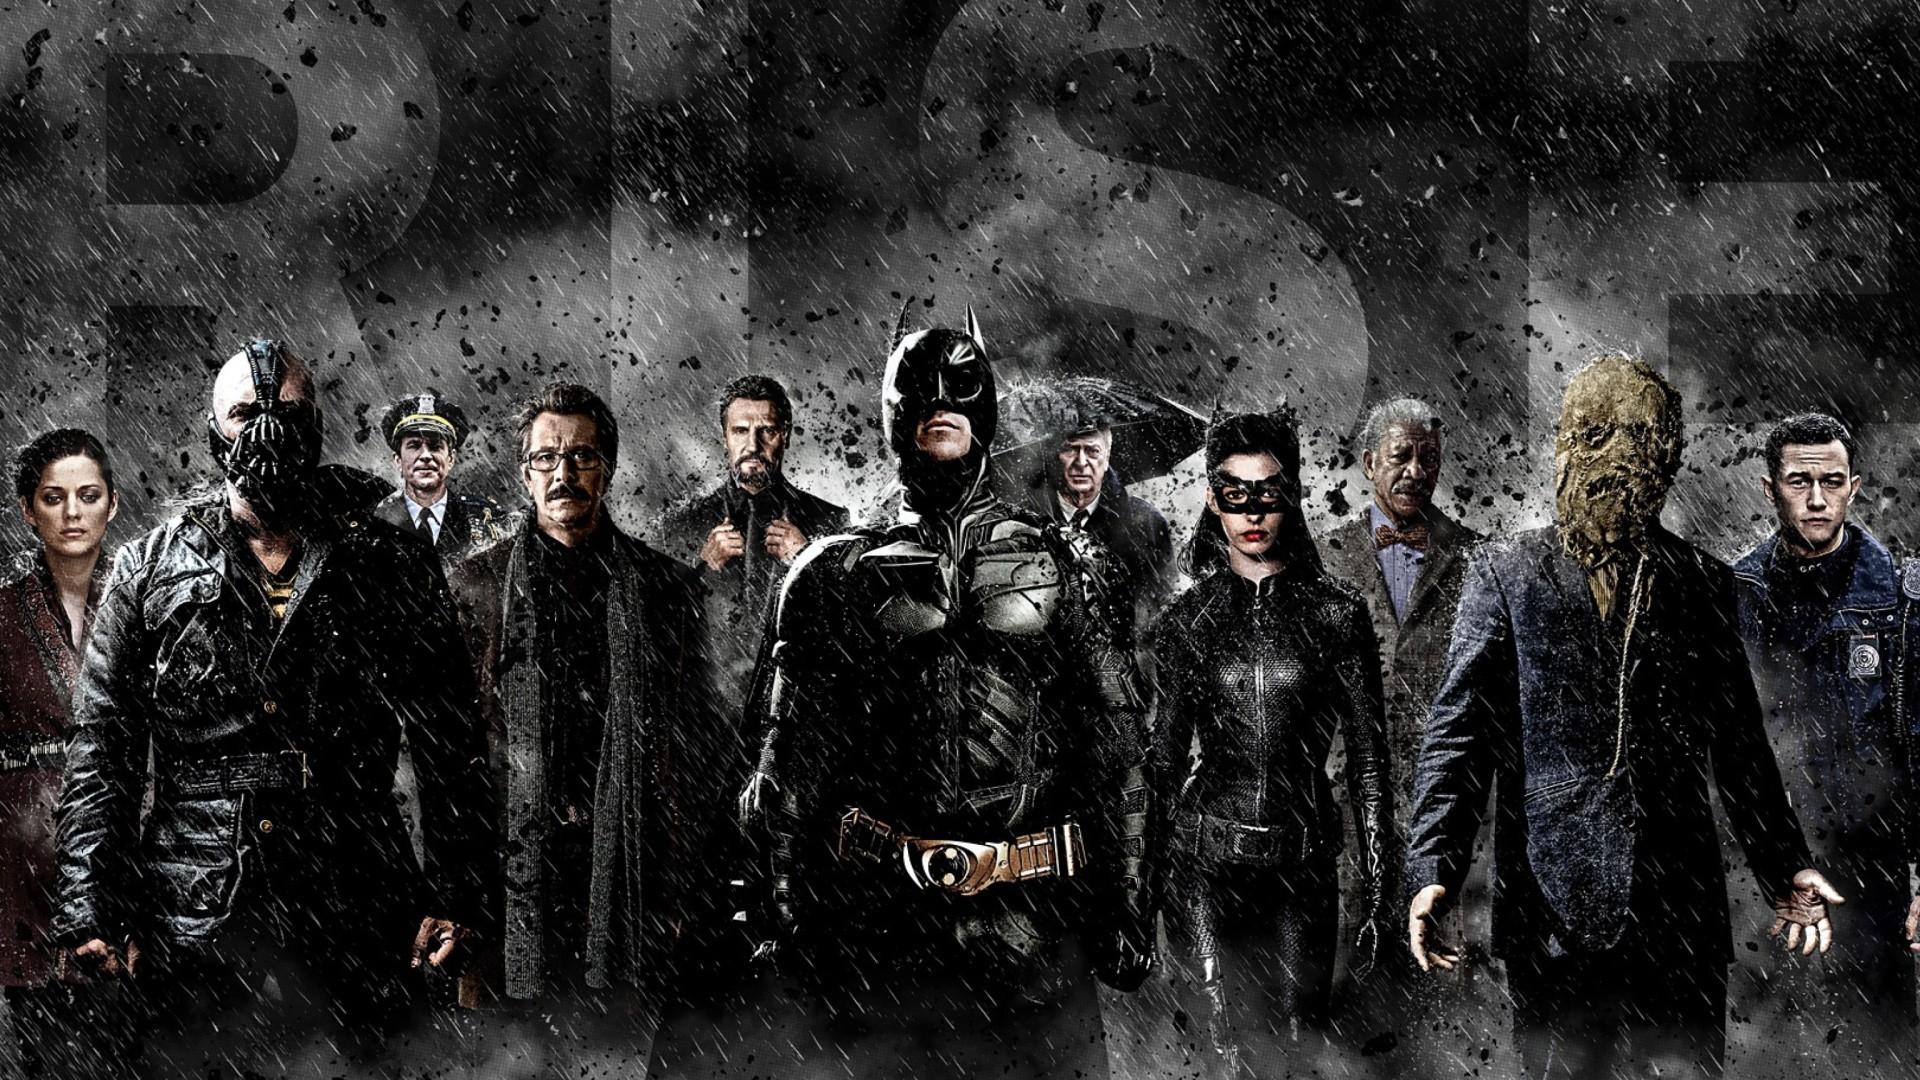 Batman Trilogy wallpaperwallpaper screensaver .